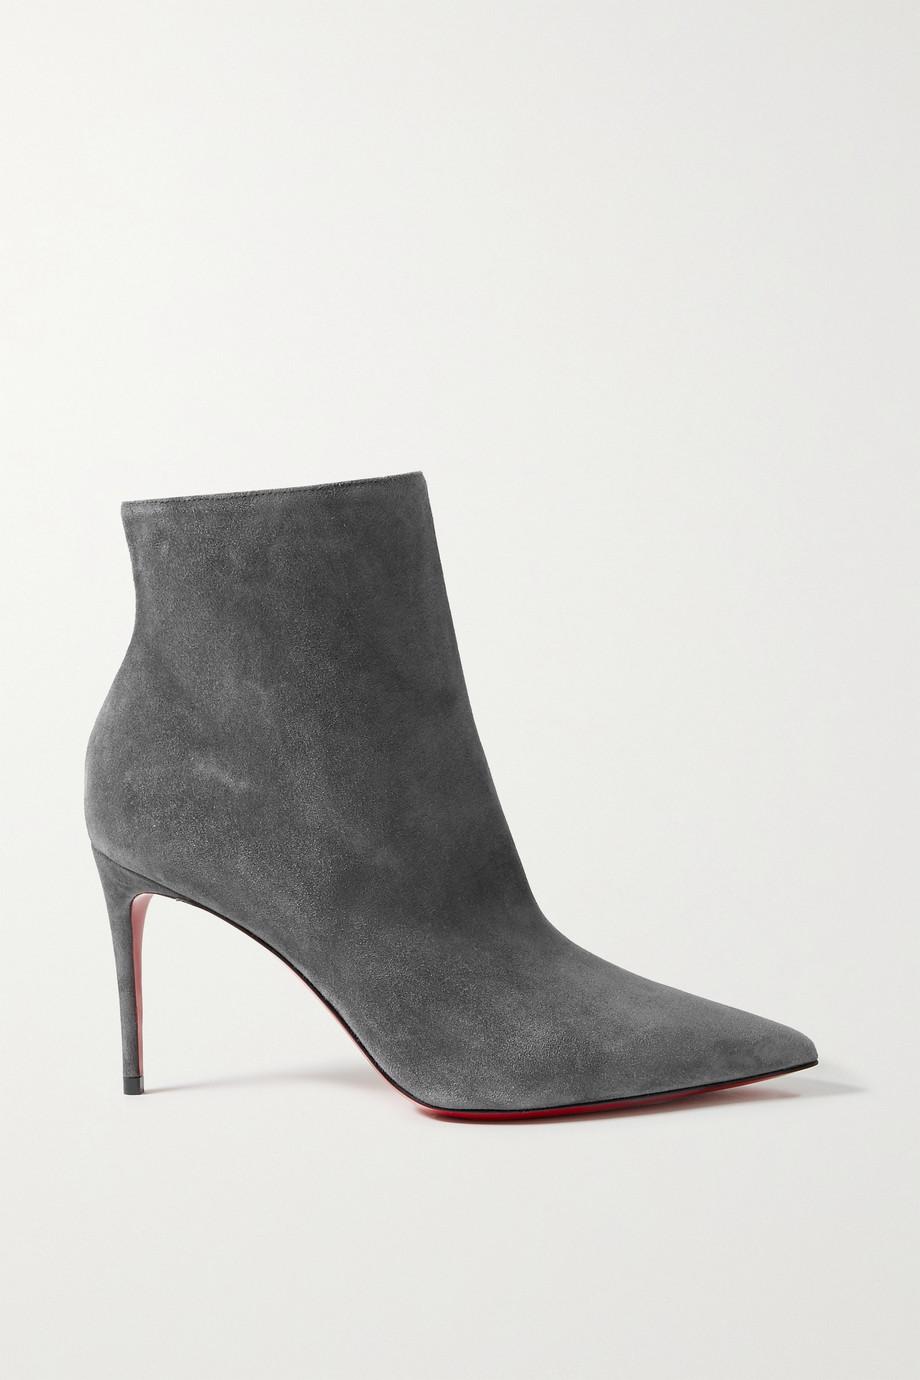 Christian Louboutin So Kate Booty 85 Ankle Boots aus Veloursleder